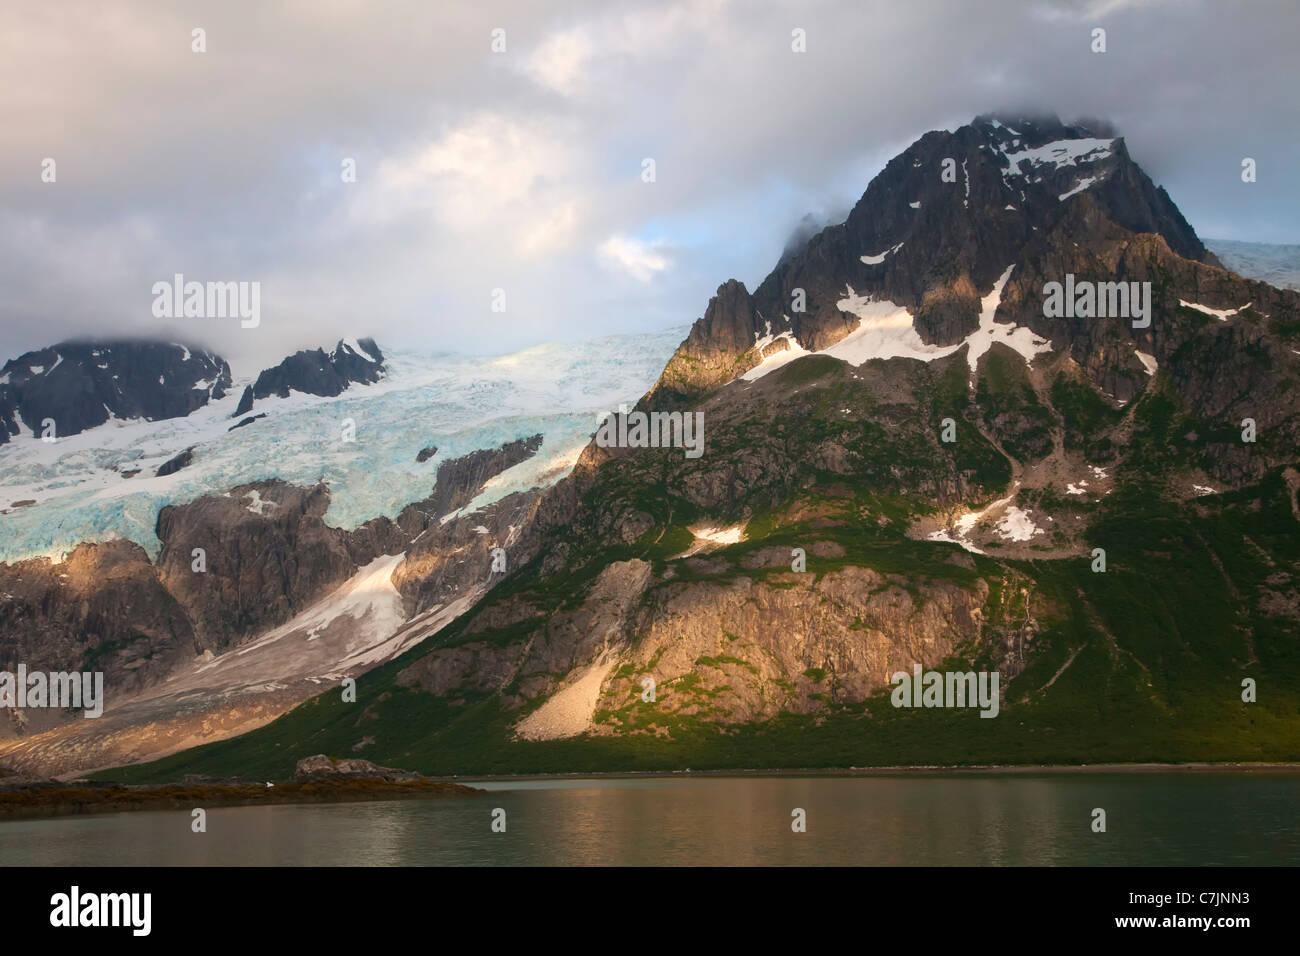 Sunset Northwestern Fjord, Kenai Fjords National Park, near Seward, Alaska. - Stock Image